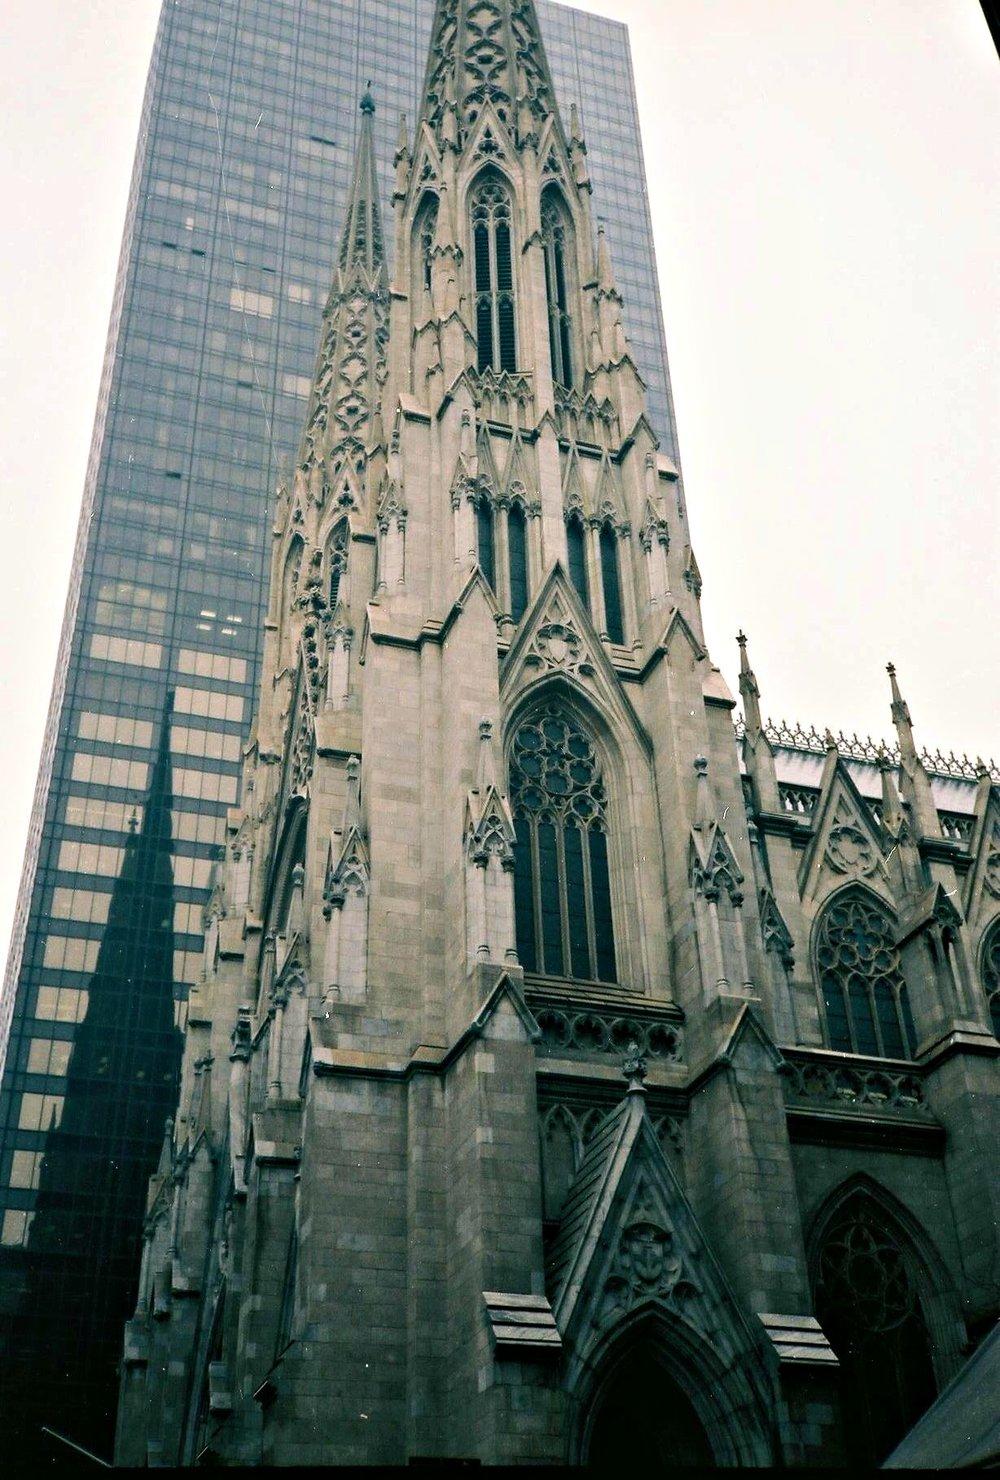 St. Patrick's Cathedral a, New York, NY, 1878